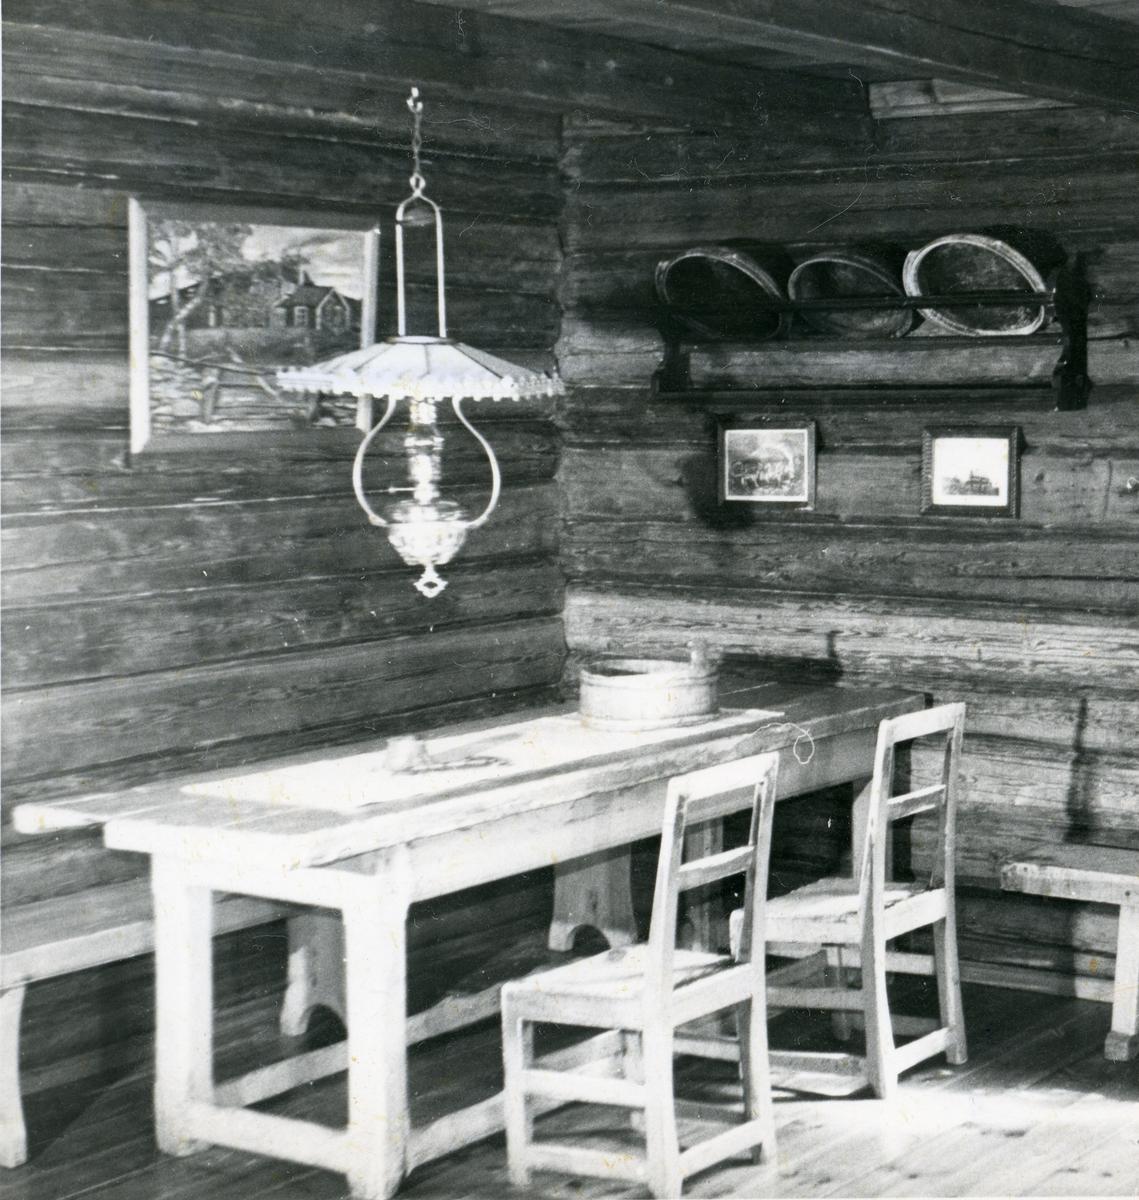 Interiør fra Stabelbygningen. Bagn Bygdesamling, Sør-Aurdal.